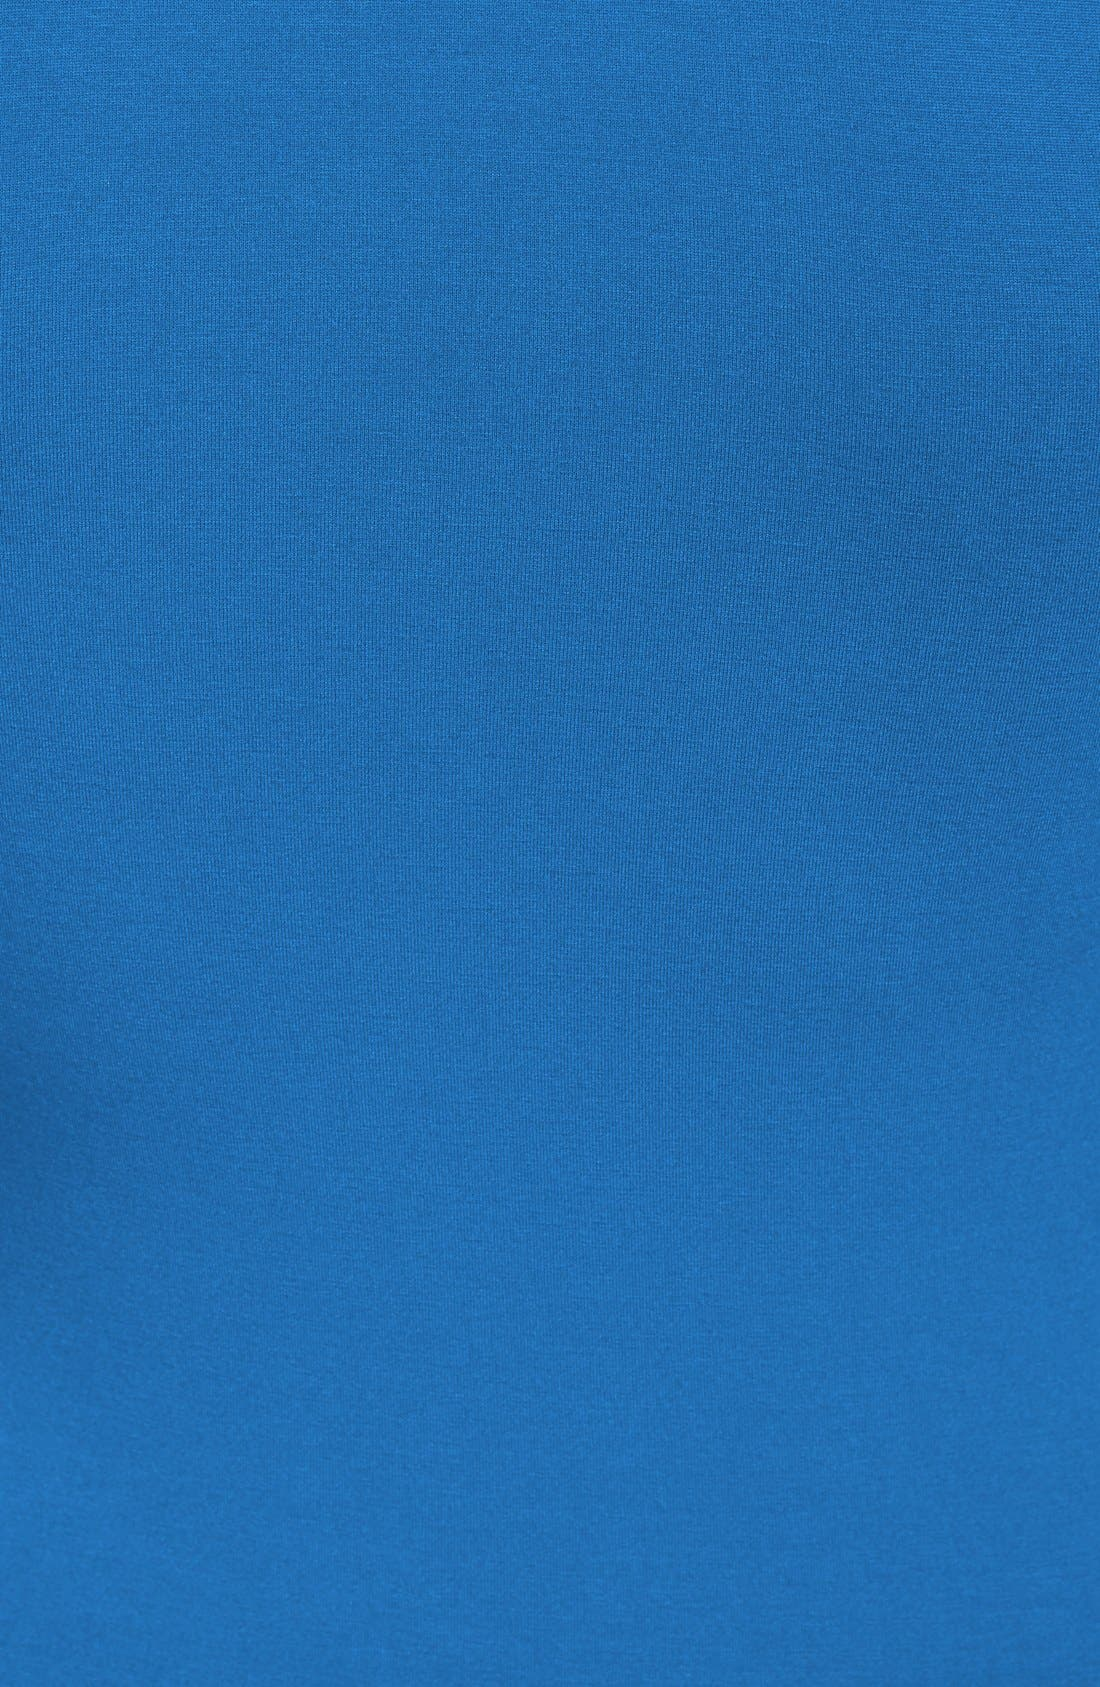 Alternate Image 3  - Topshop Contrast Trim Jersey Midi Dress (Nordstrom Exclusive)